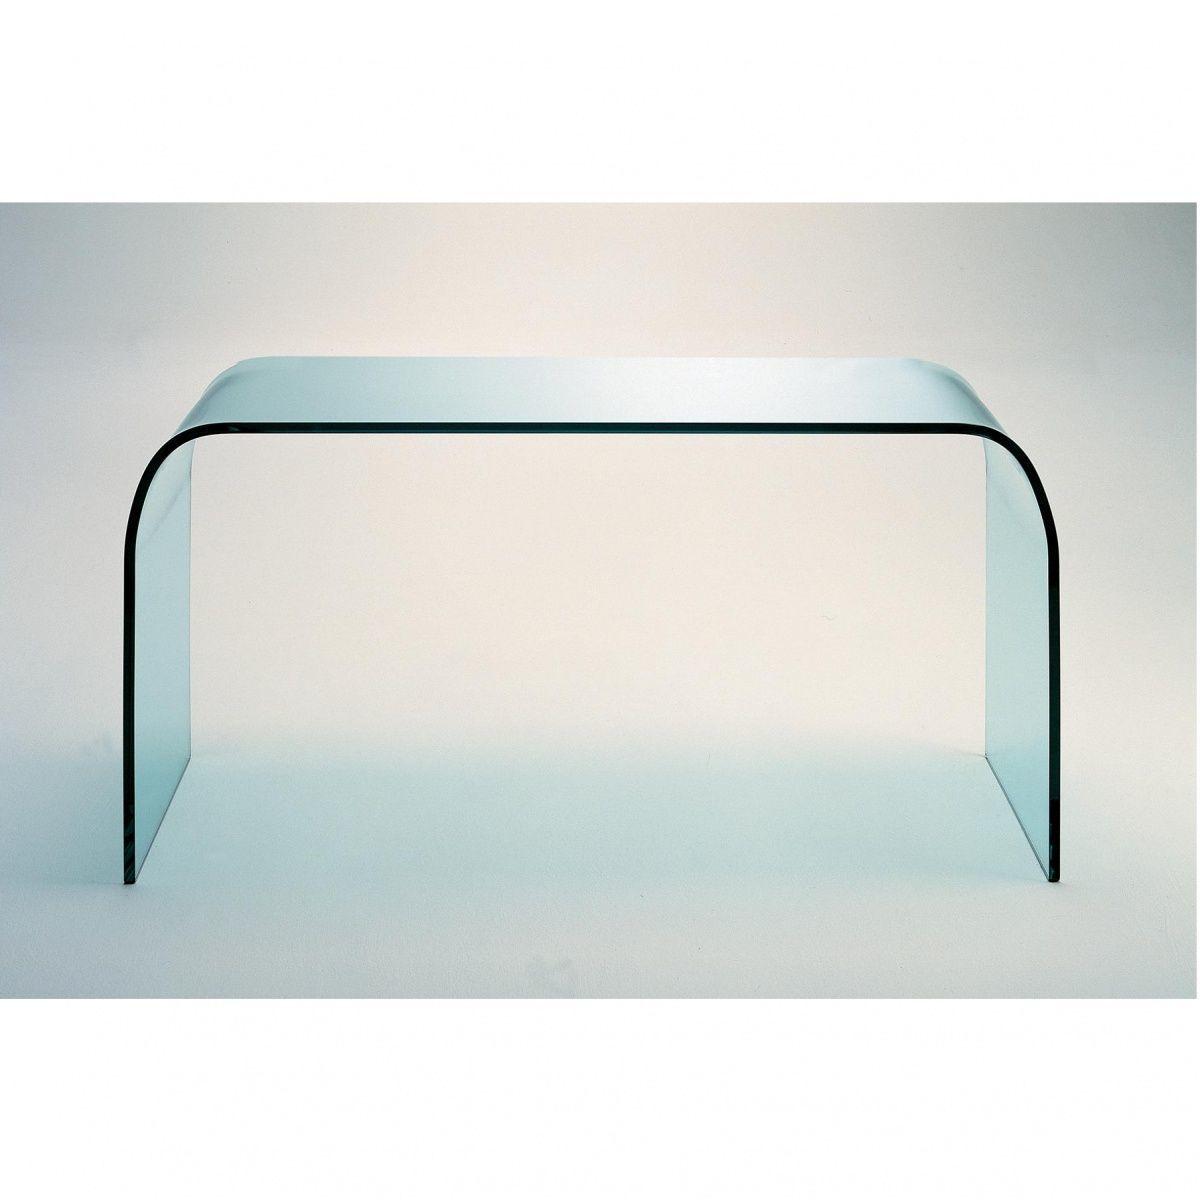 fontana table coffee table fontana arte. Black Bedroom Furniture Sets. Home Design Ideas